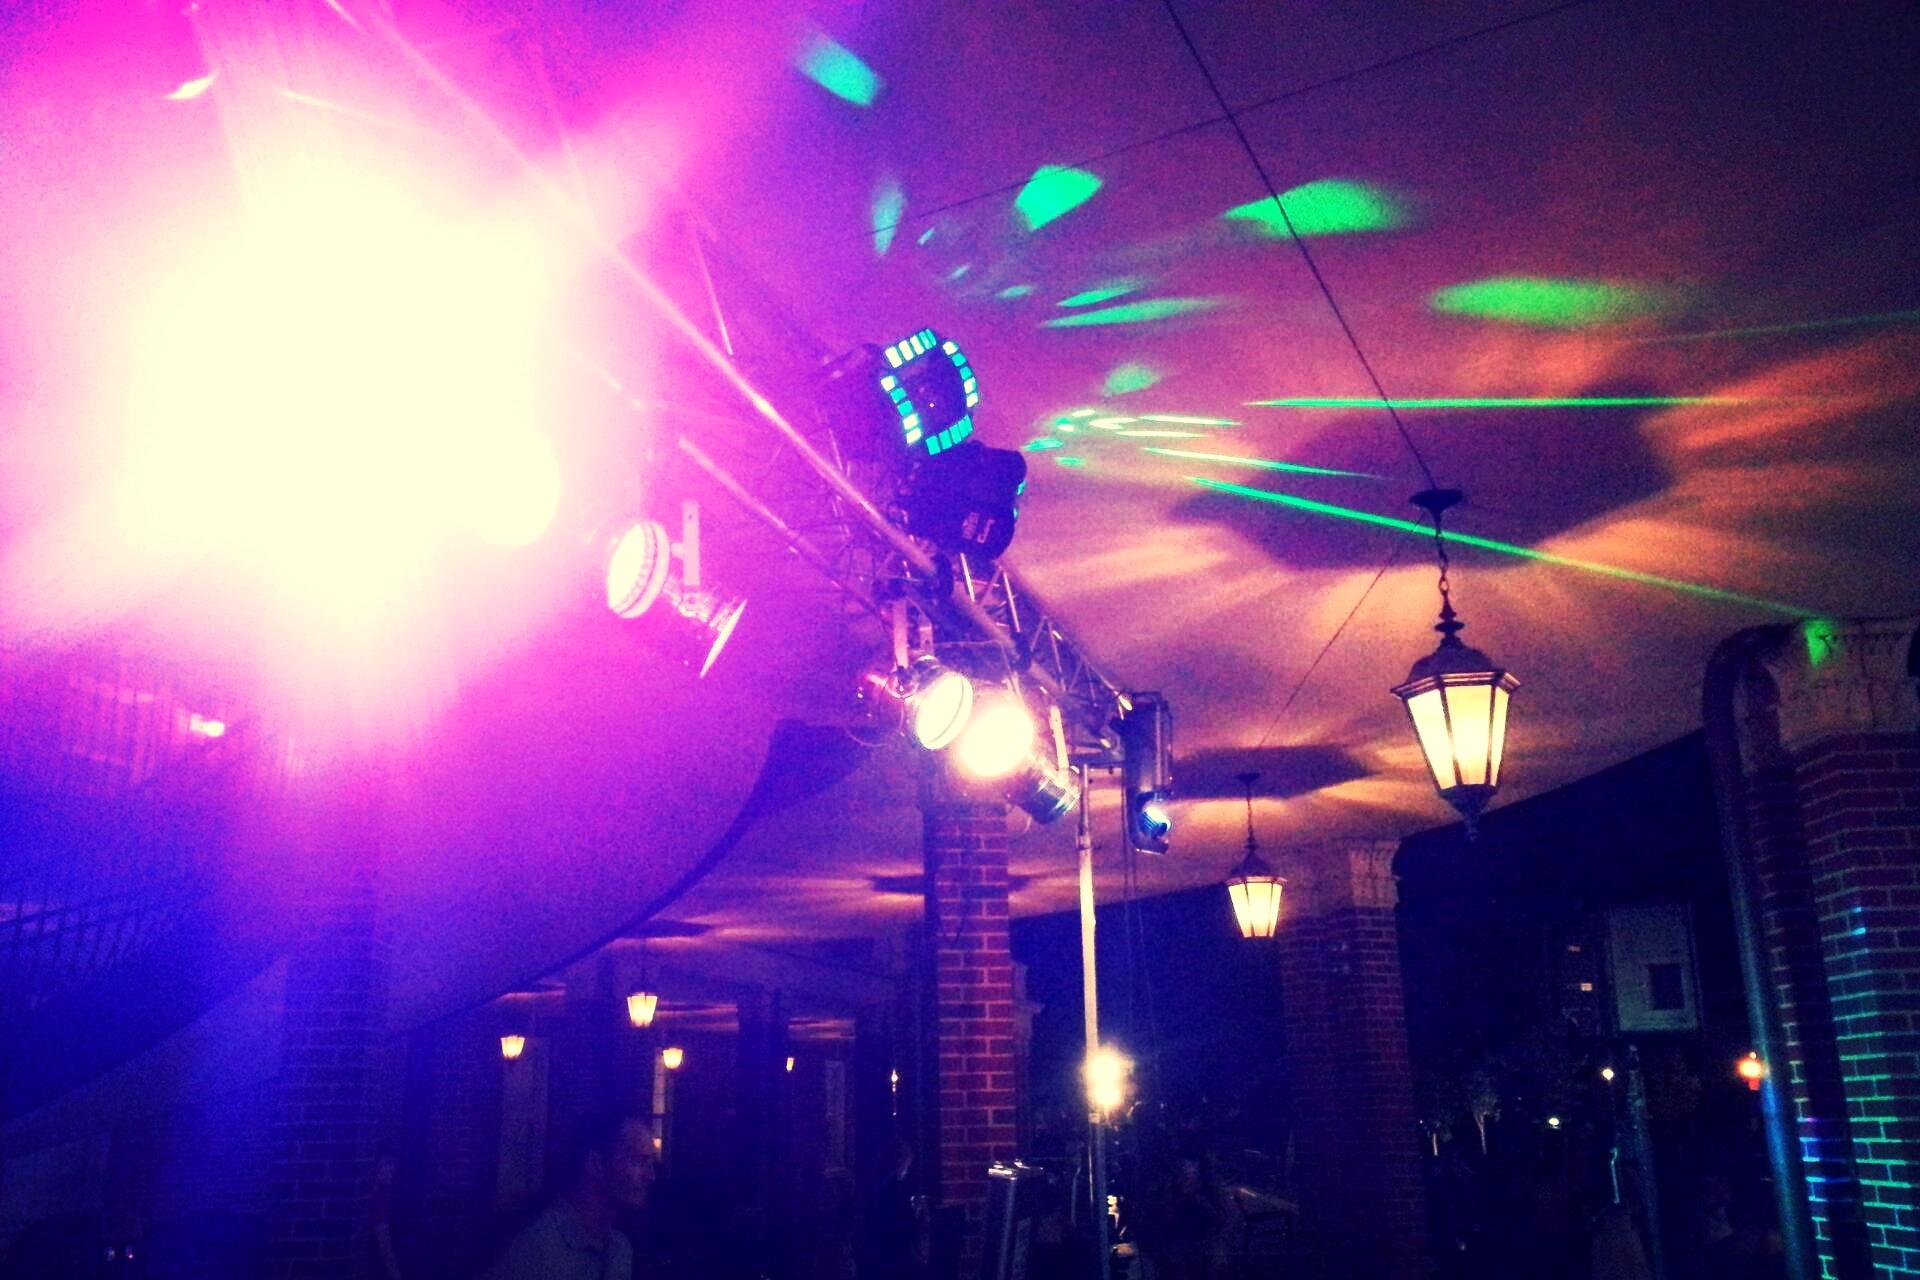 Dance Lighting.